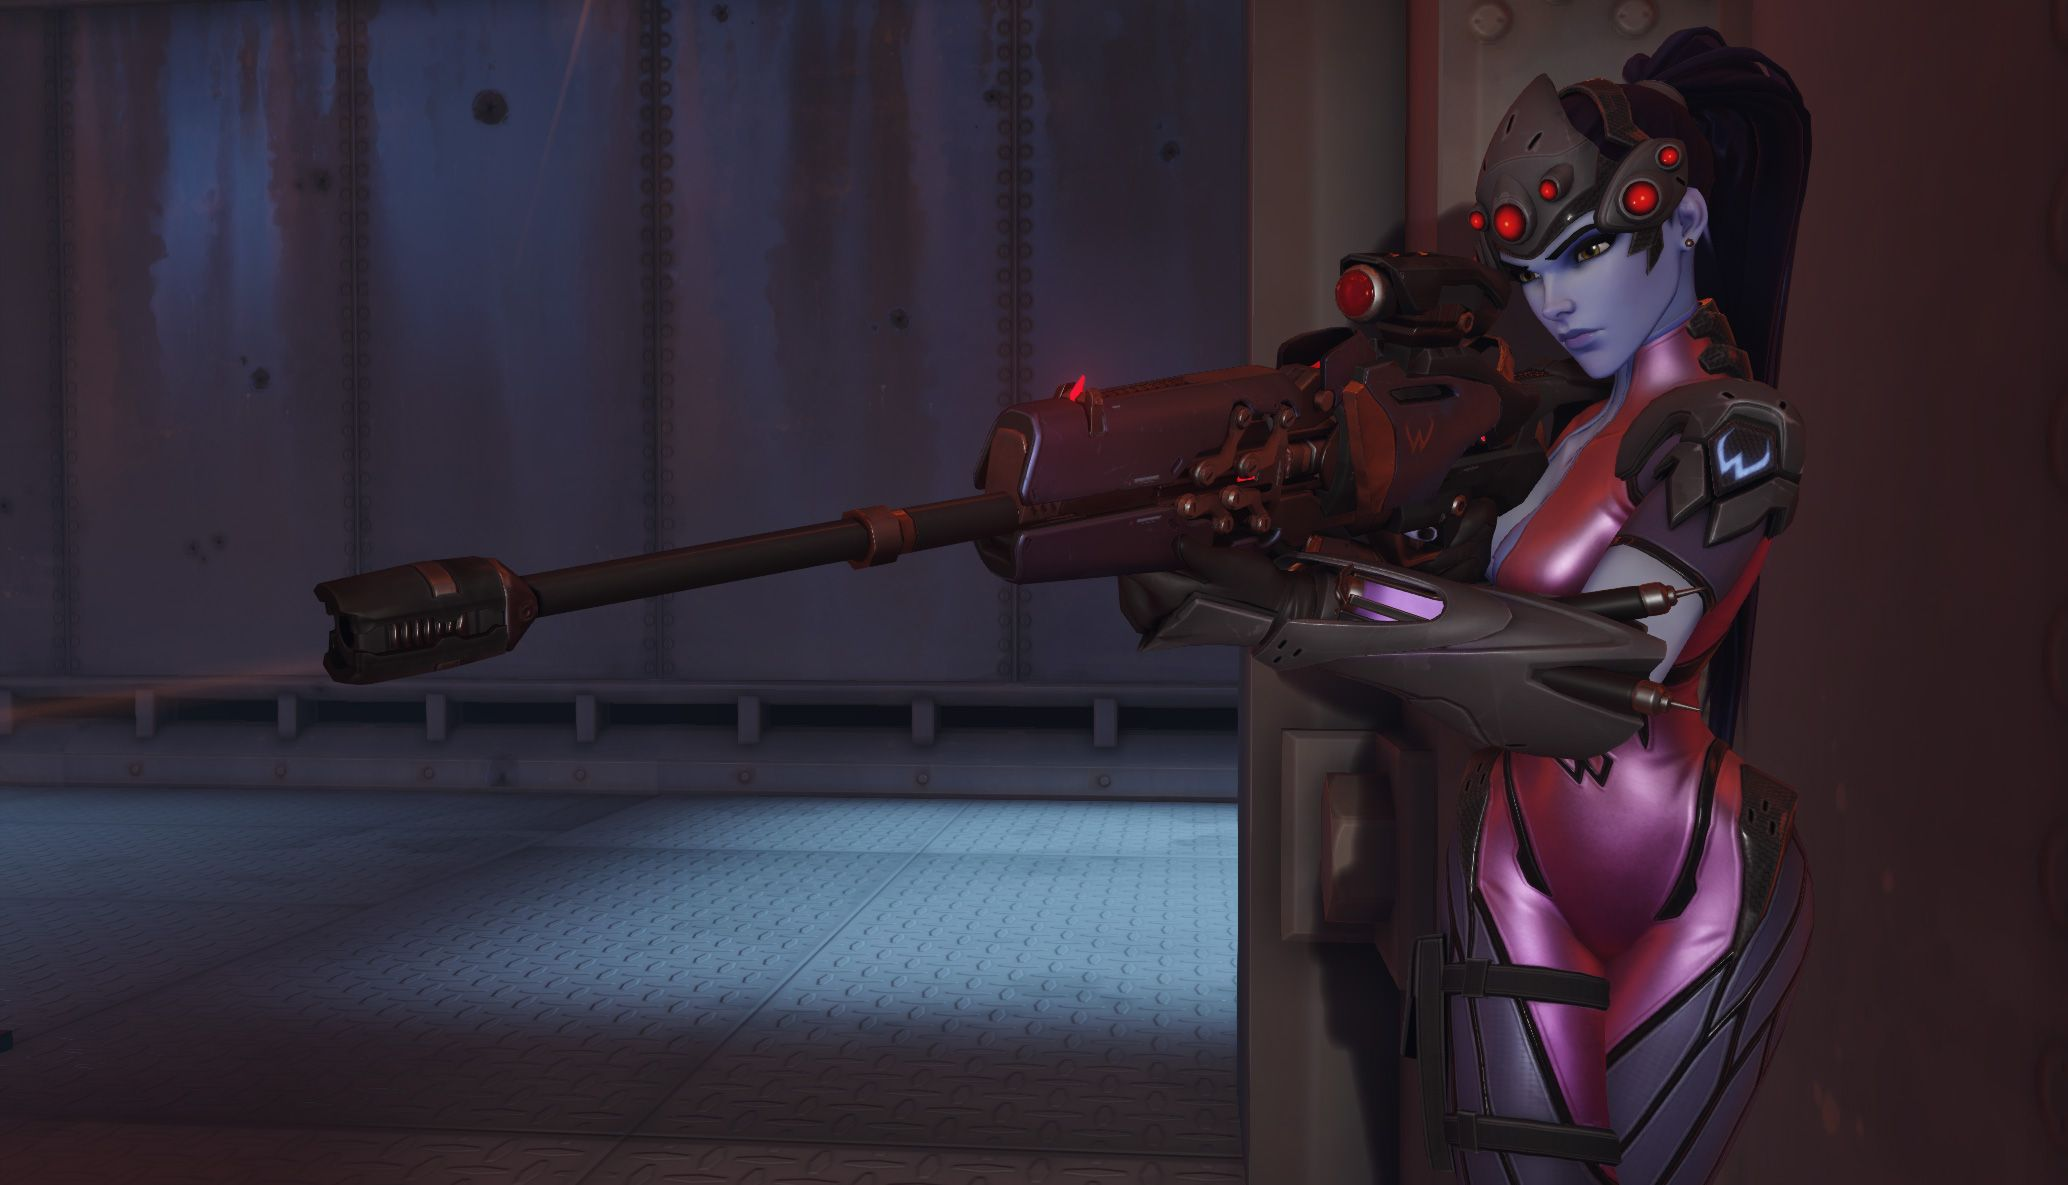 Ana Nerf, Widowmaker Buff: New Overwatch PTR Live - http://techraptor.net/content/new-ovetwatch-ptr-live   Gaming, News